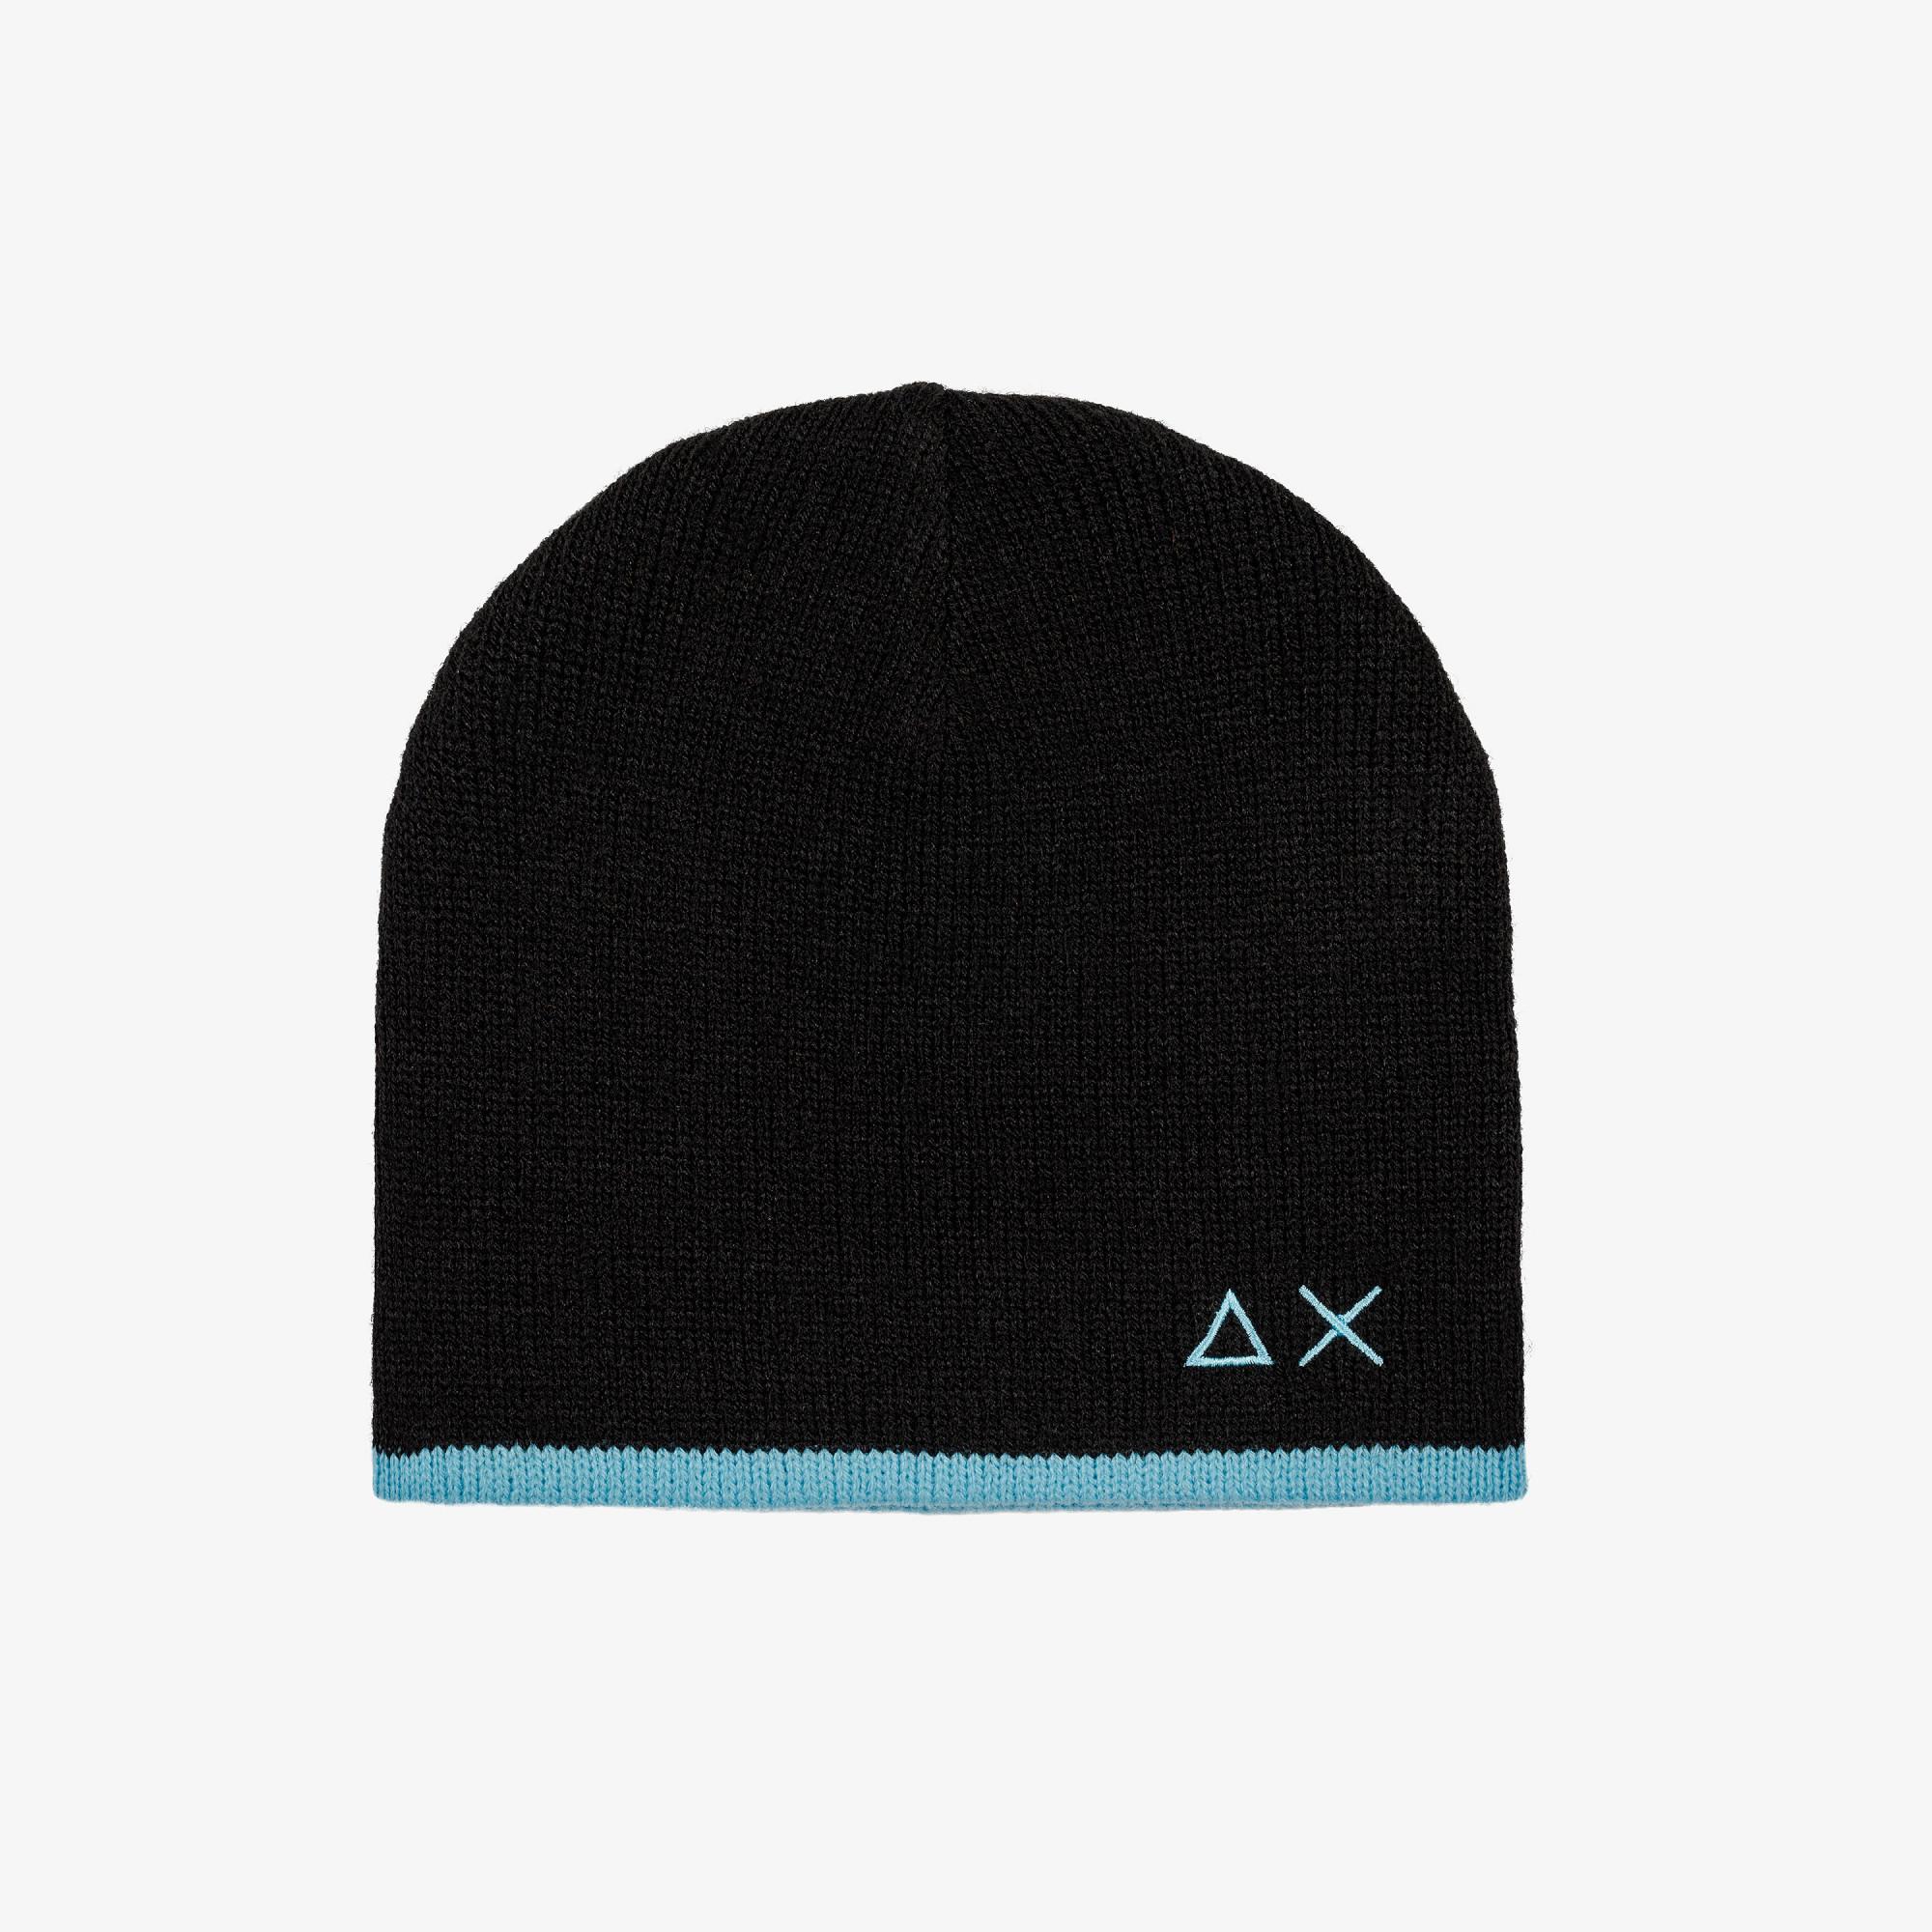 BOY'S CAP BASIC BLACK